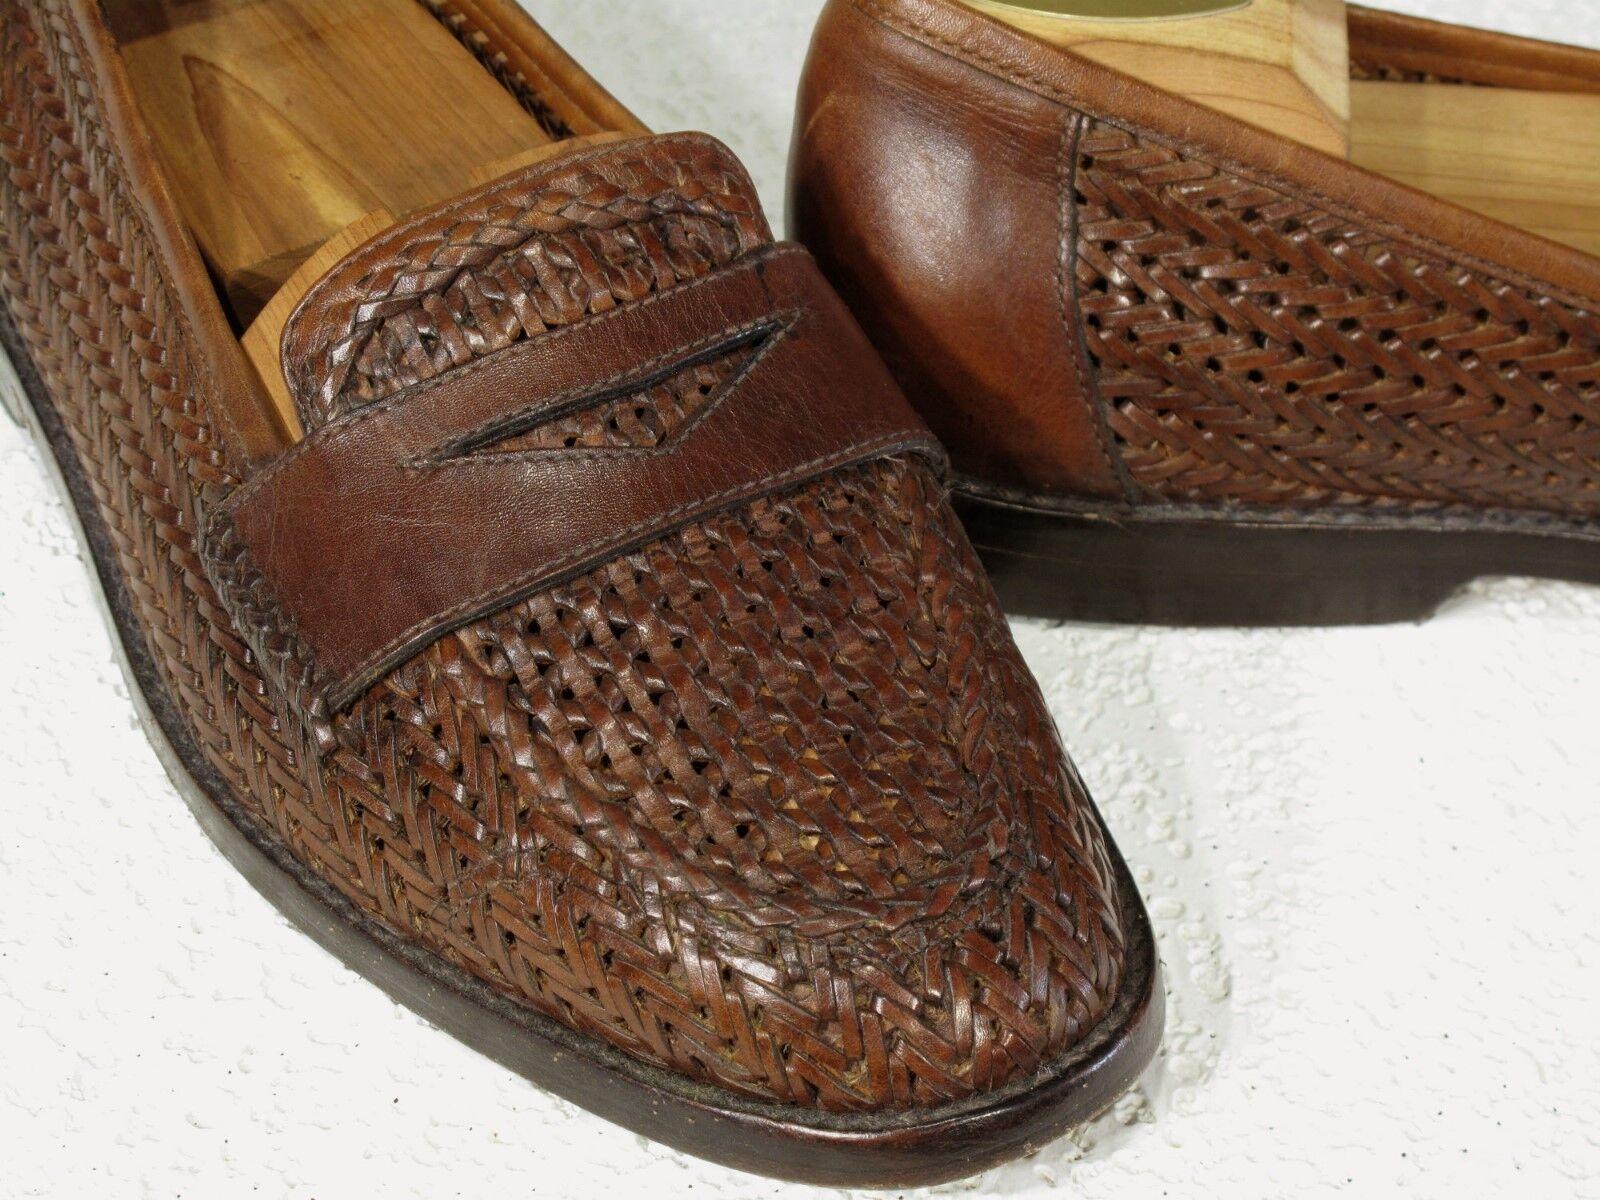 COLE HAAN RESORT Woven Calf Brown Penny Loafers Slip on Shoes 9.5M Scarpe classiche da uomo